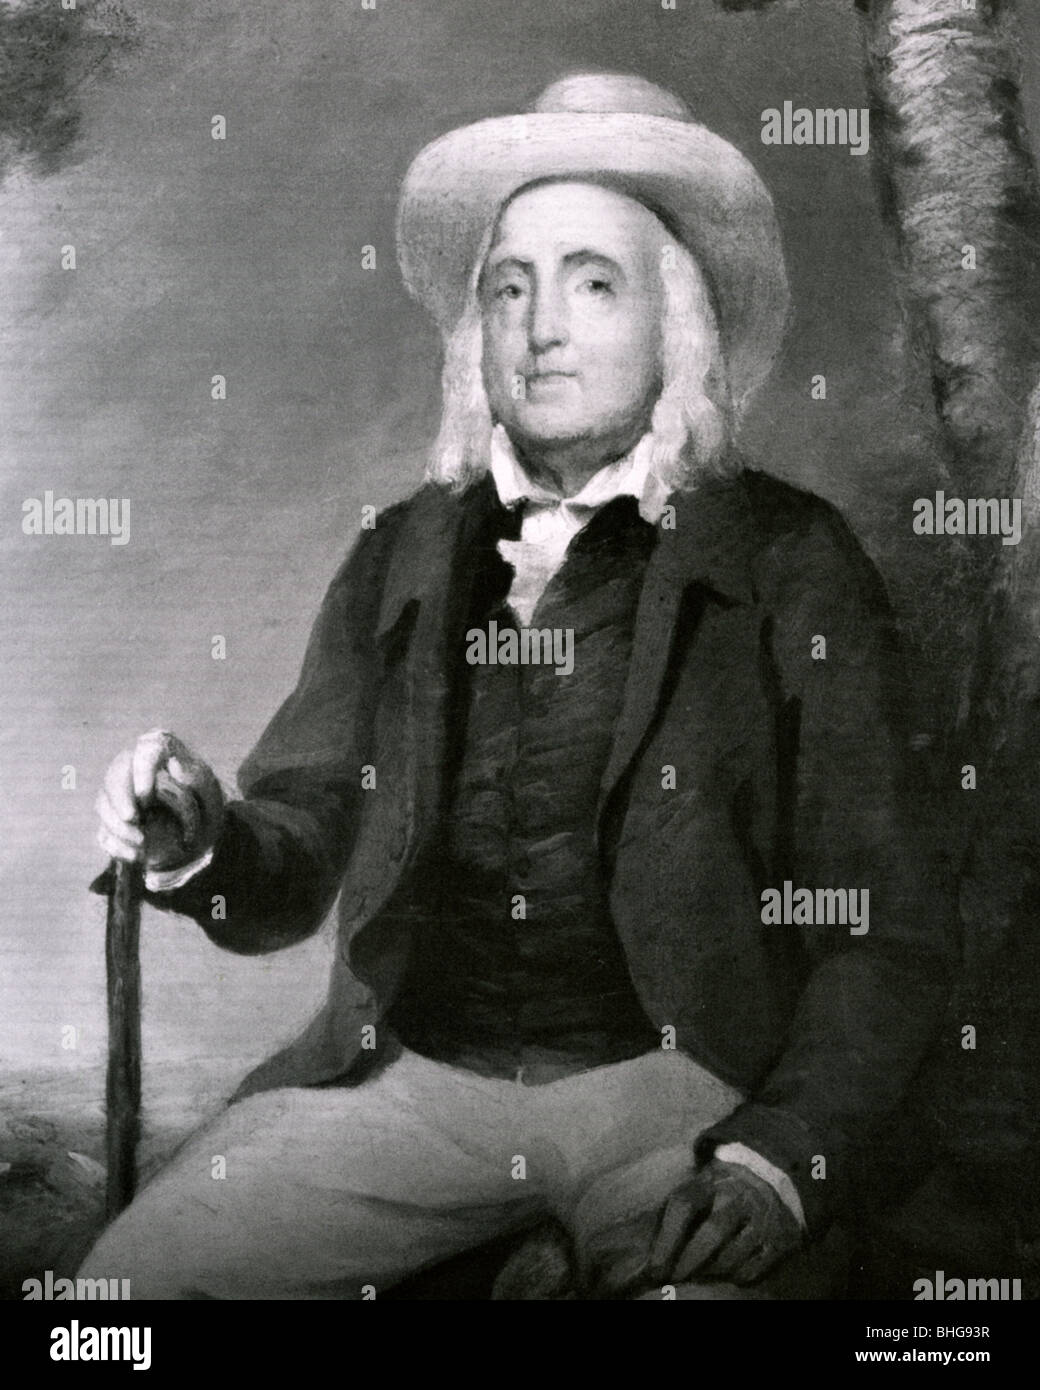 JEREMY BENTHAM - English philosopher and social reformer (1748-1832) - Stock Image